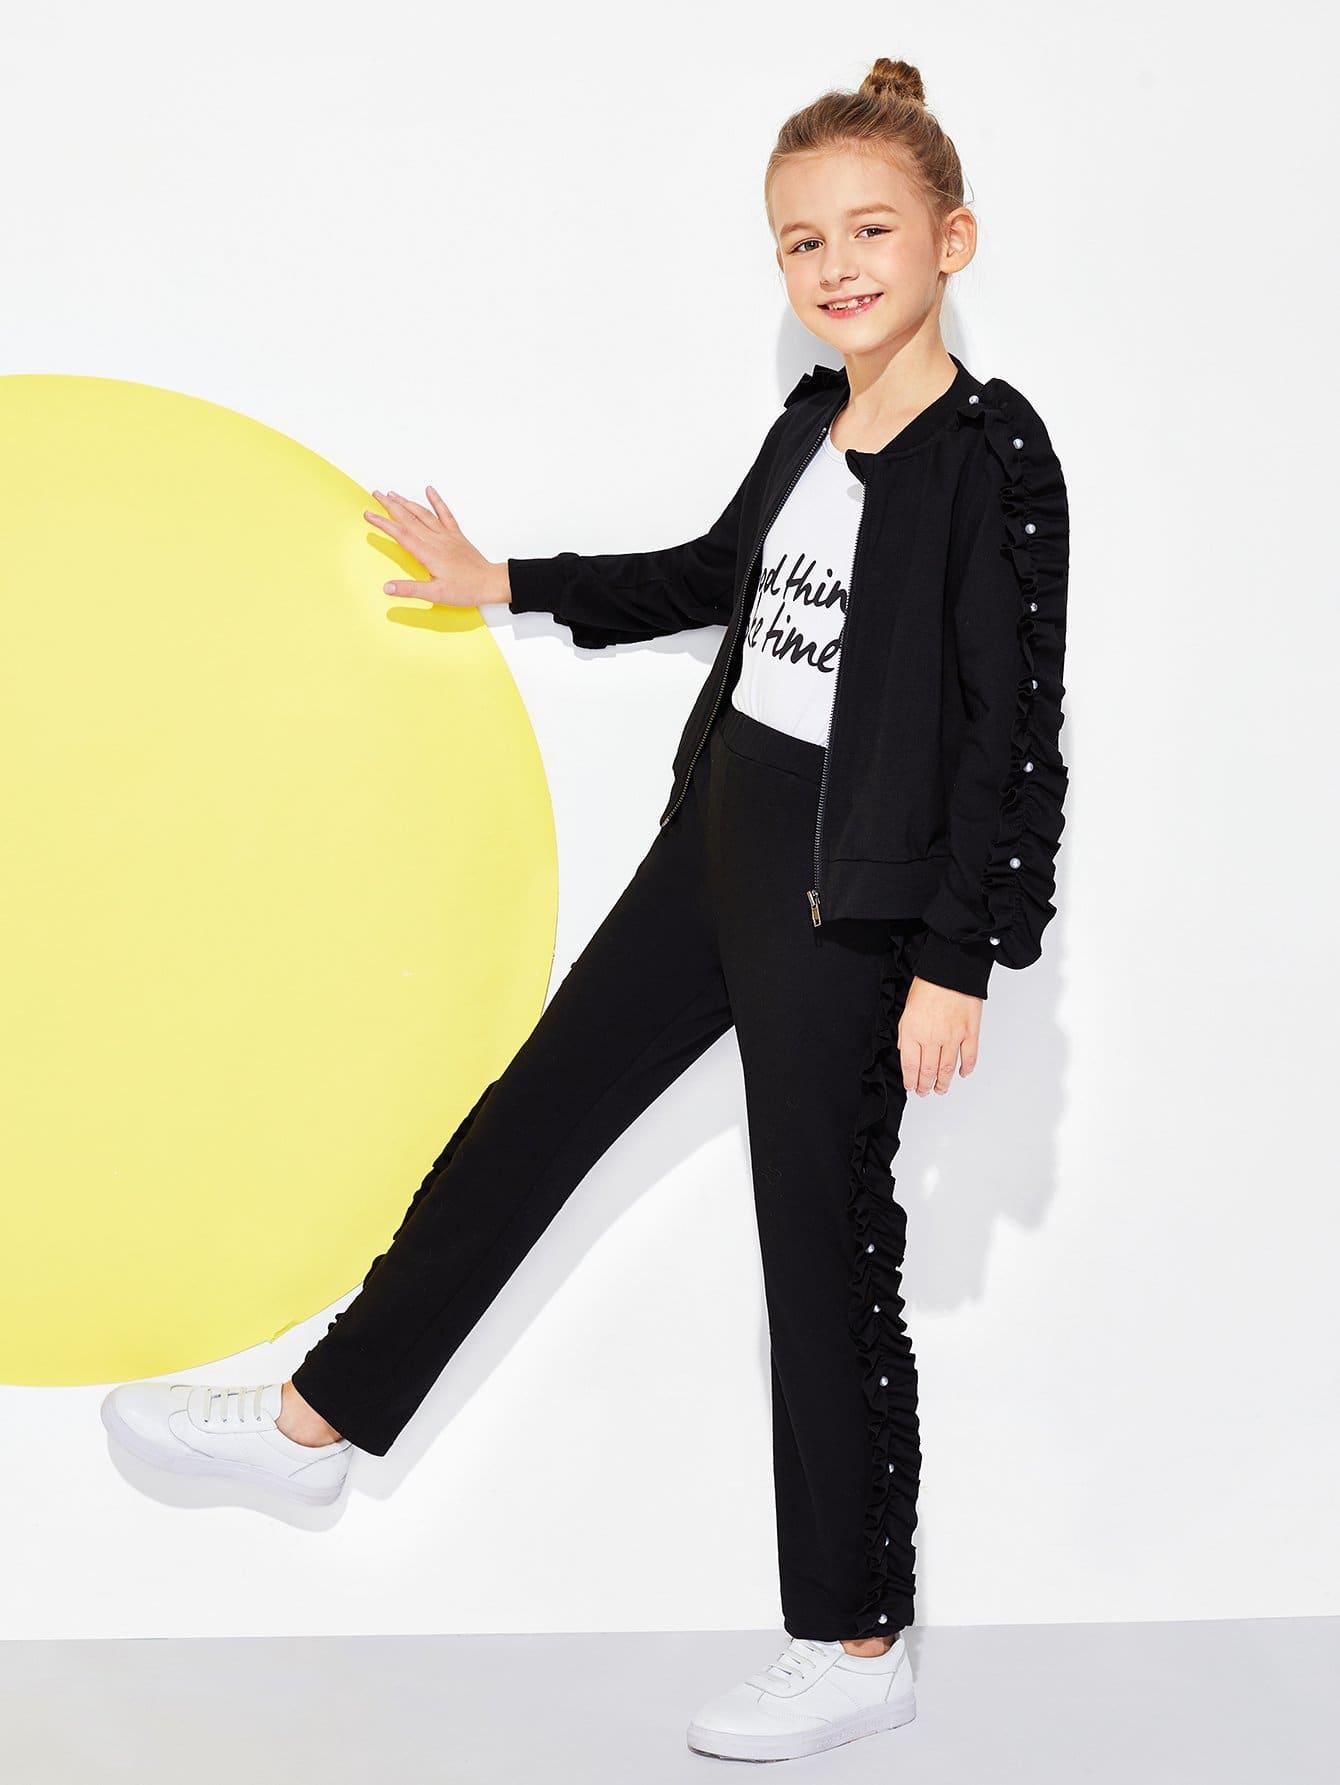 Фото - Свитшот с жемчугами и брюки комплеки для девочек от SheIn черного цвета